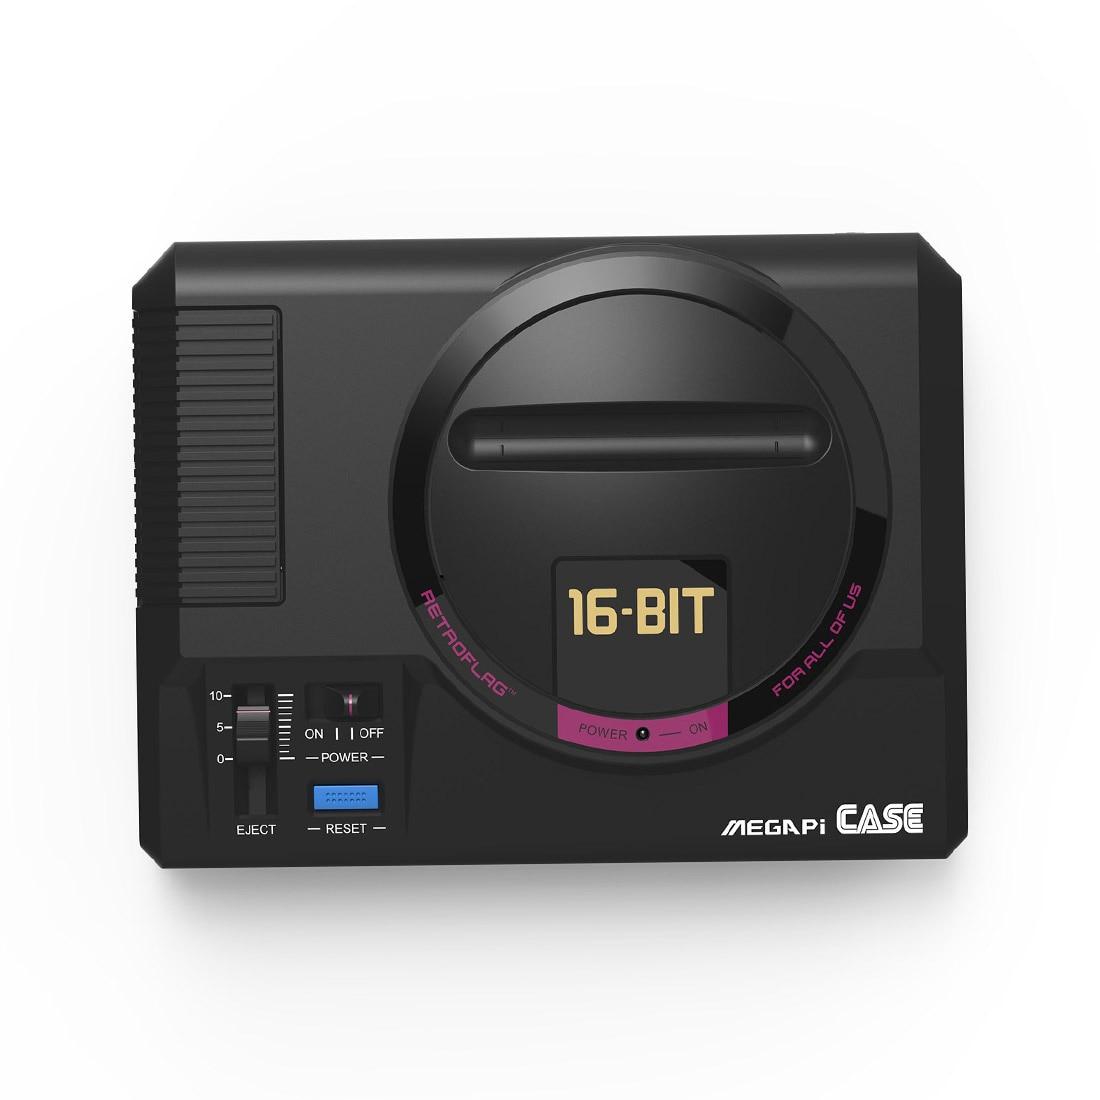 MODIKER Retroflag Classic Video Games Box Reset Button Safe Shutdown Megapi Case For Raspberry Pi 3 B+ B Plus) Programmable Toys